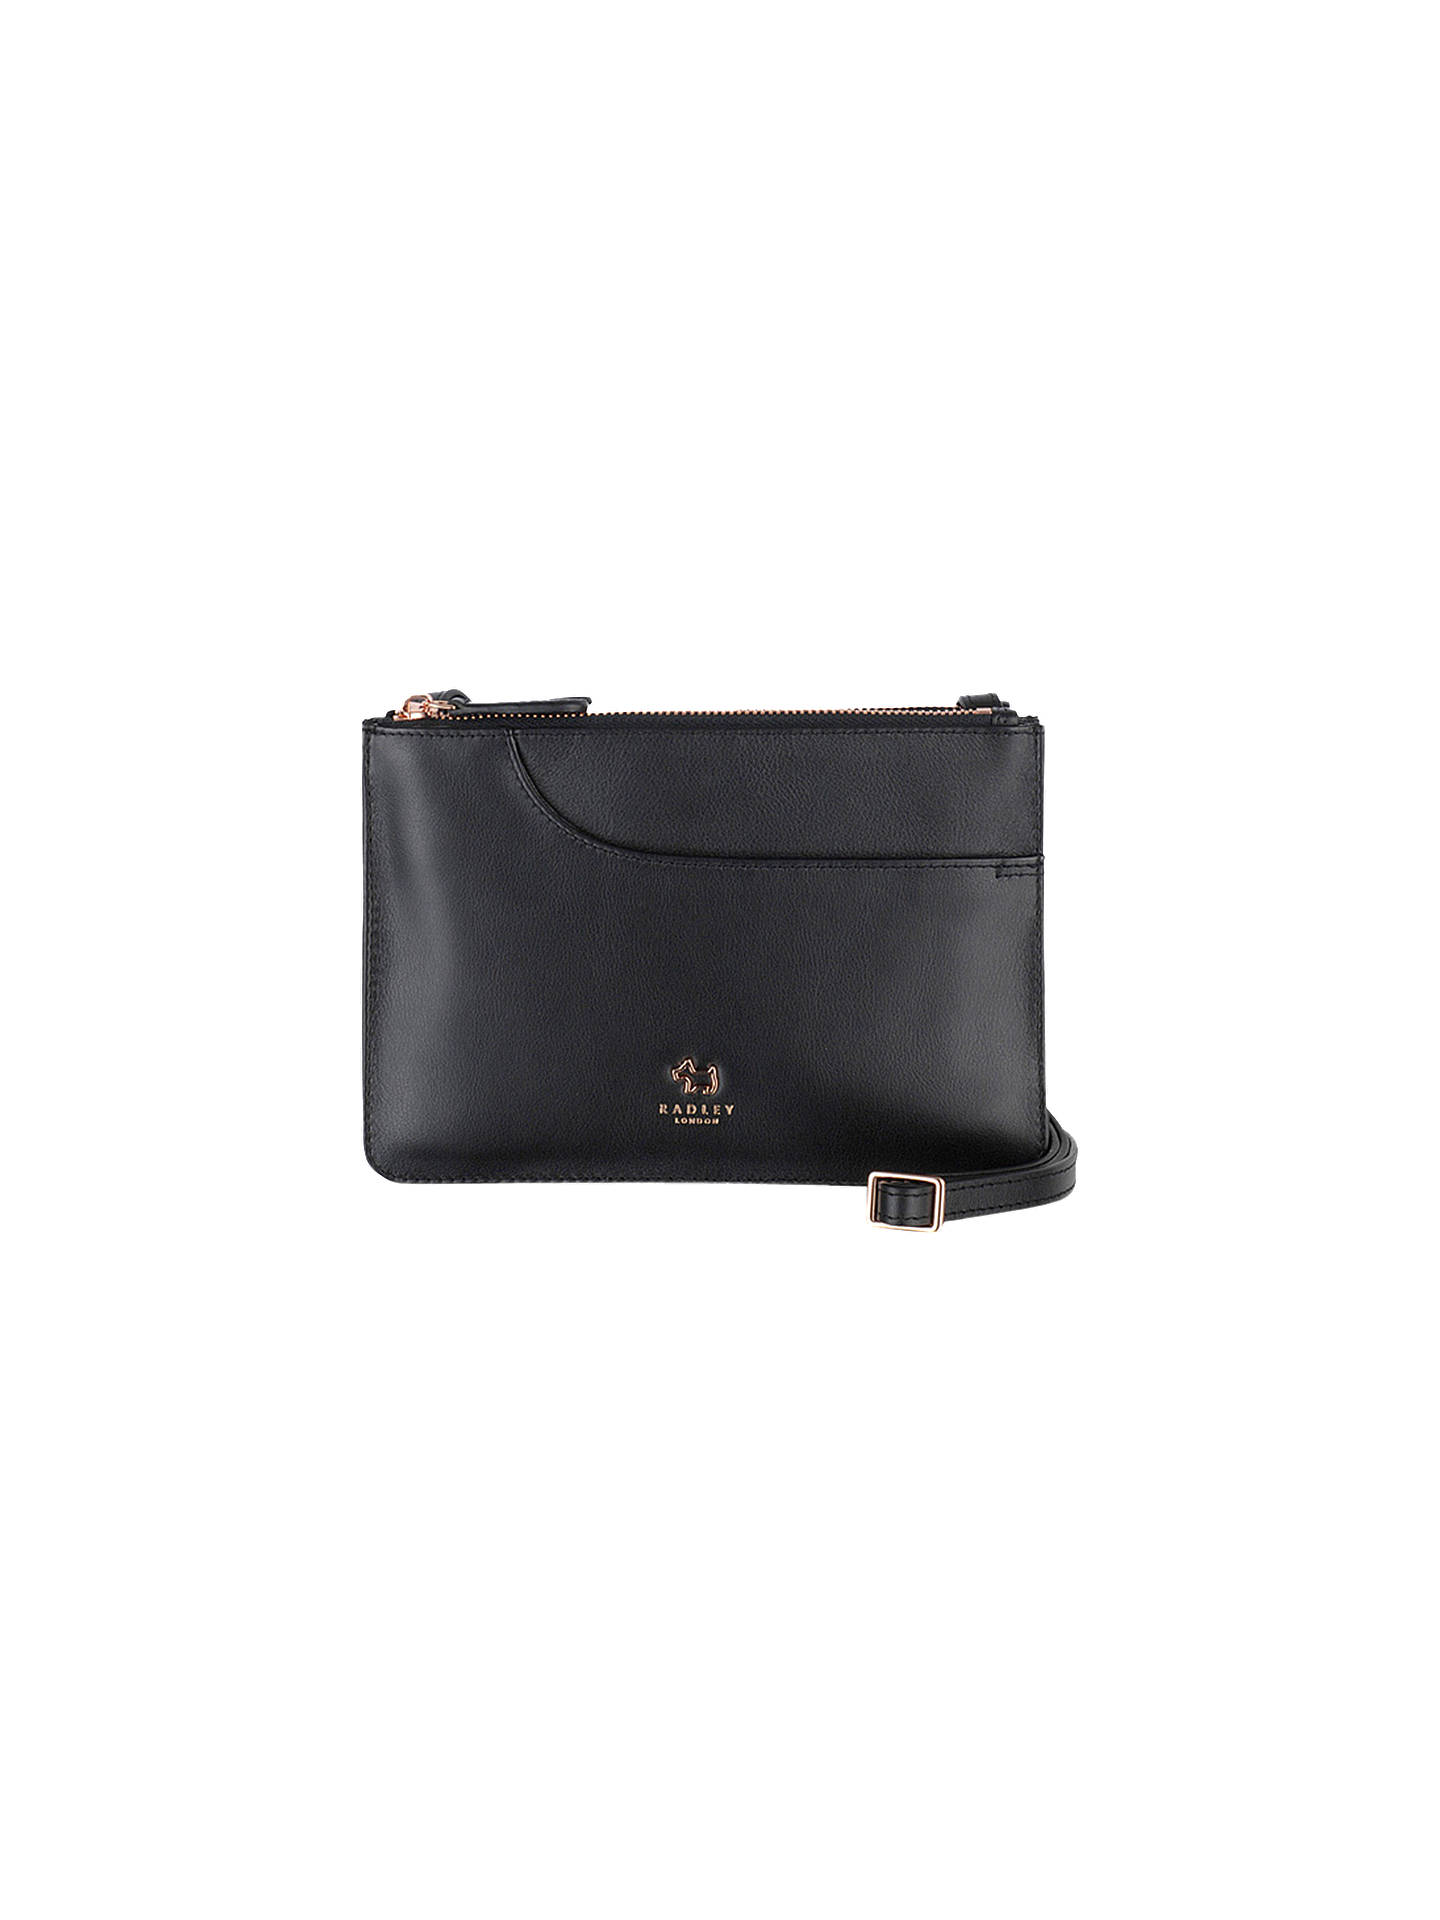 Buy Radley Pockets Leather Small Cross Body Bag b3881ee8442af